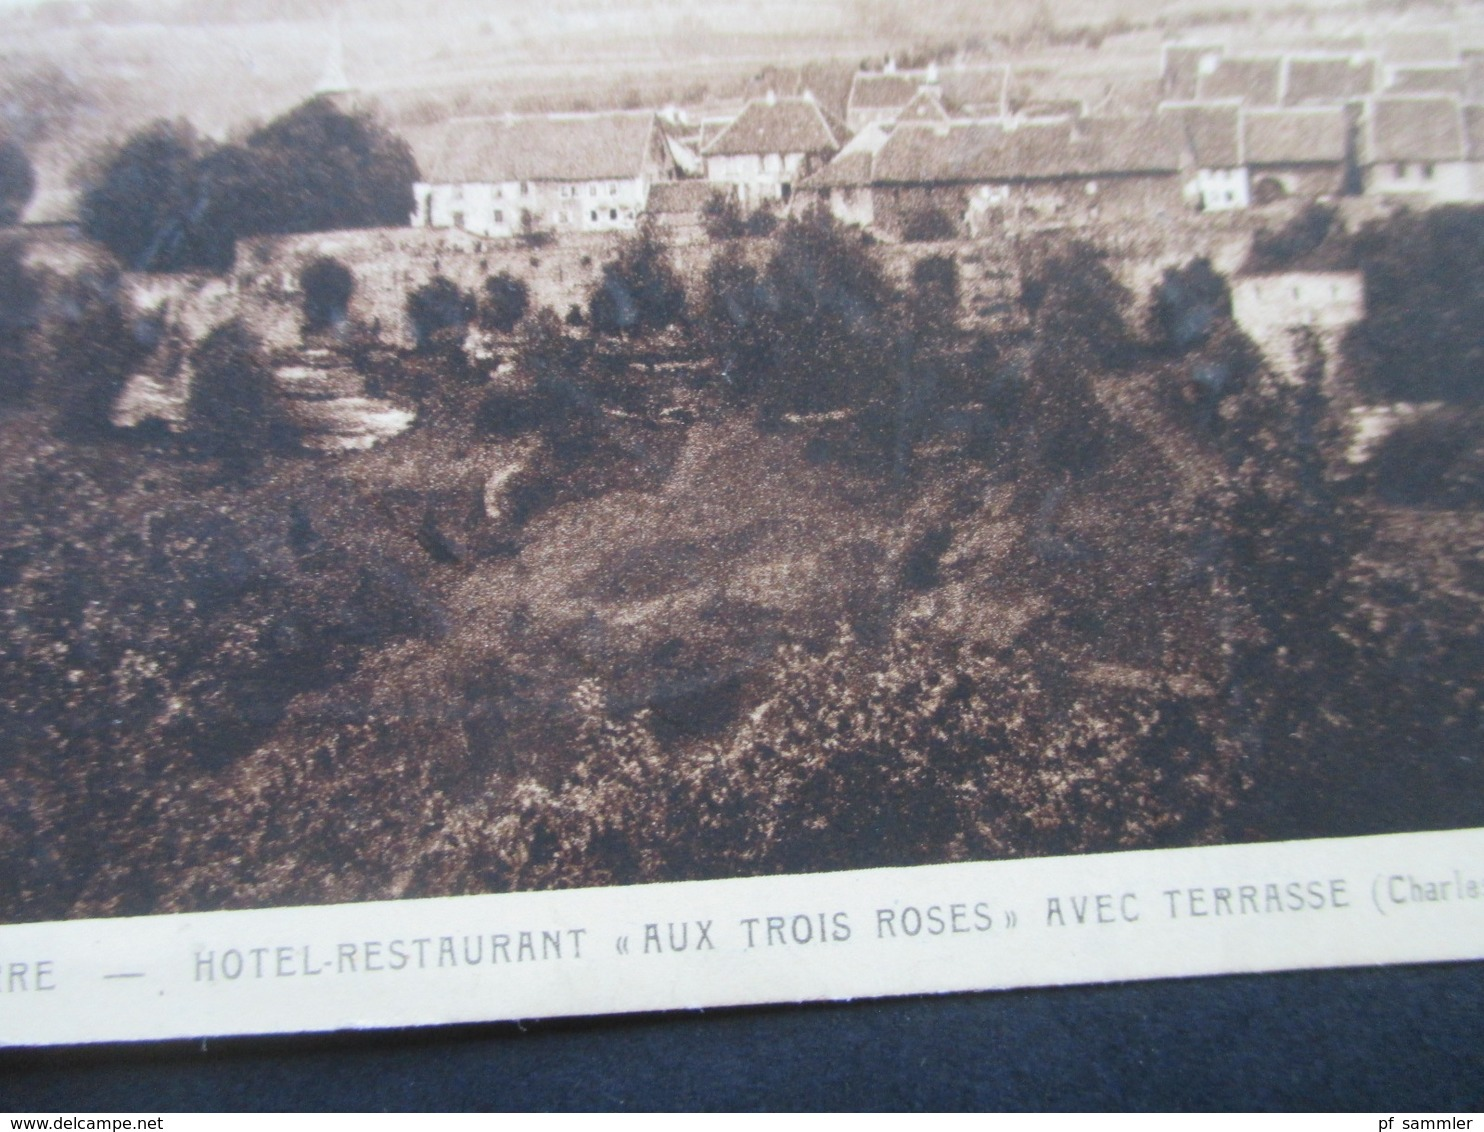 AK 1930er Jahre La Petite Pierre Hotel Restaurant Aux Trois Roses Avec Terrasse (Charles Geyer) - Hotels & Gaststätten